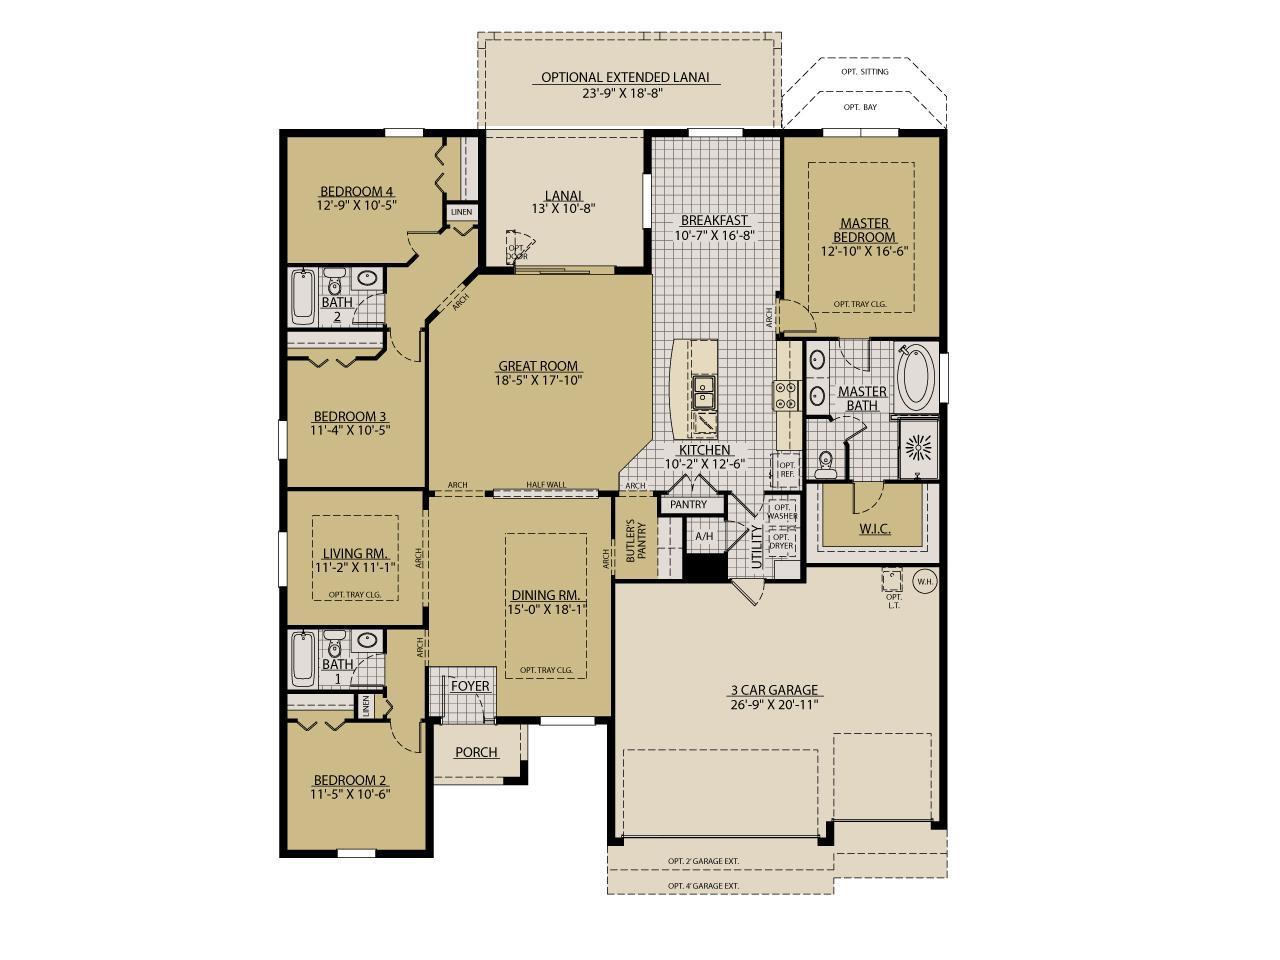 Sandestin New Home Floor Plan – William Ryan Homes Floor Plans